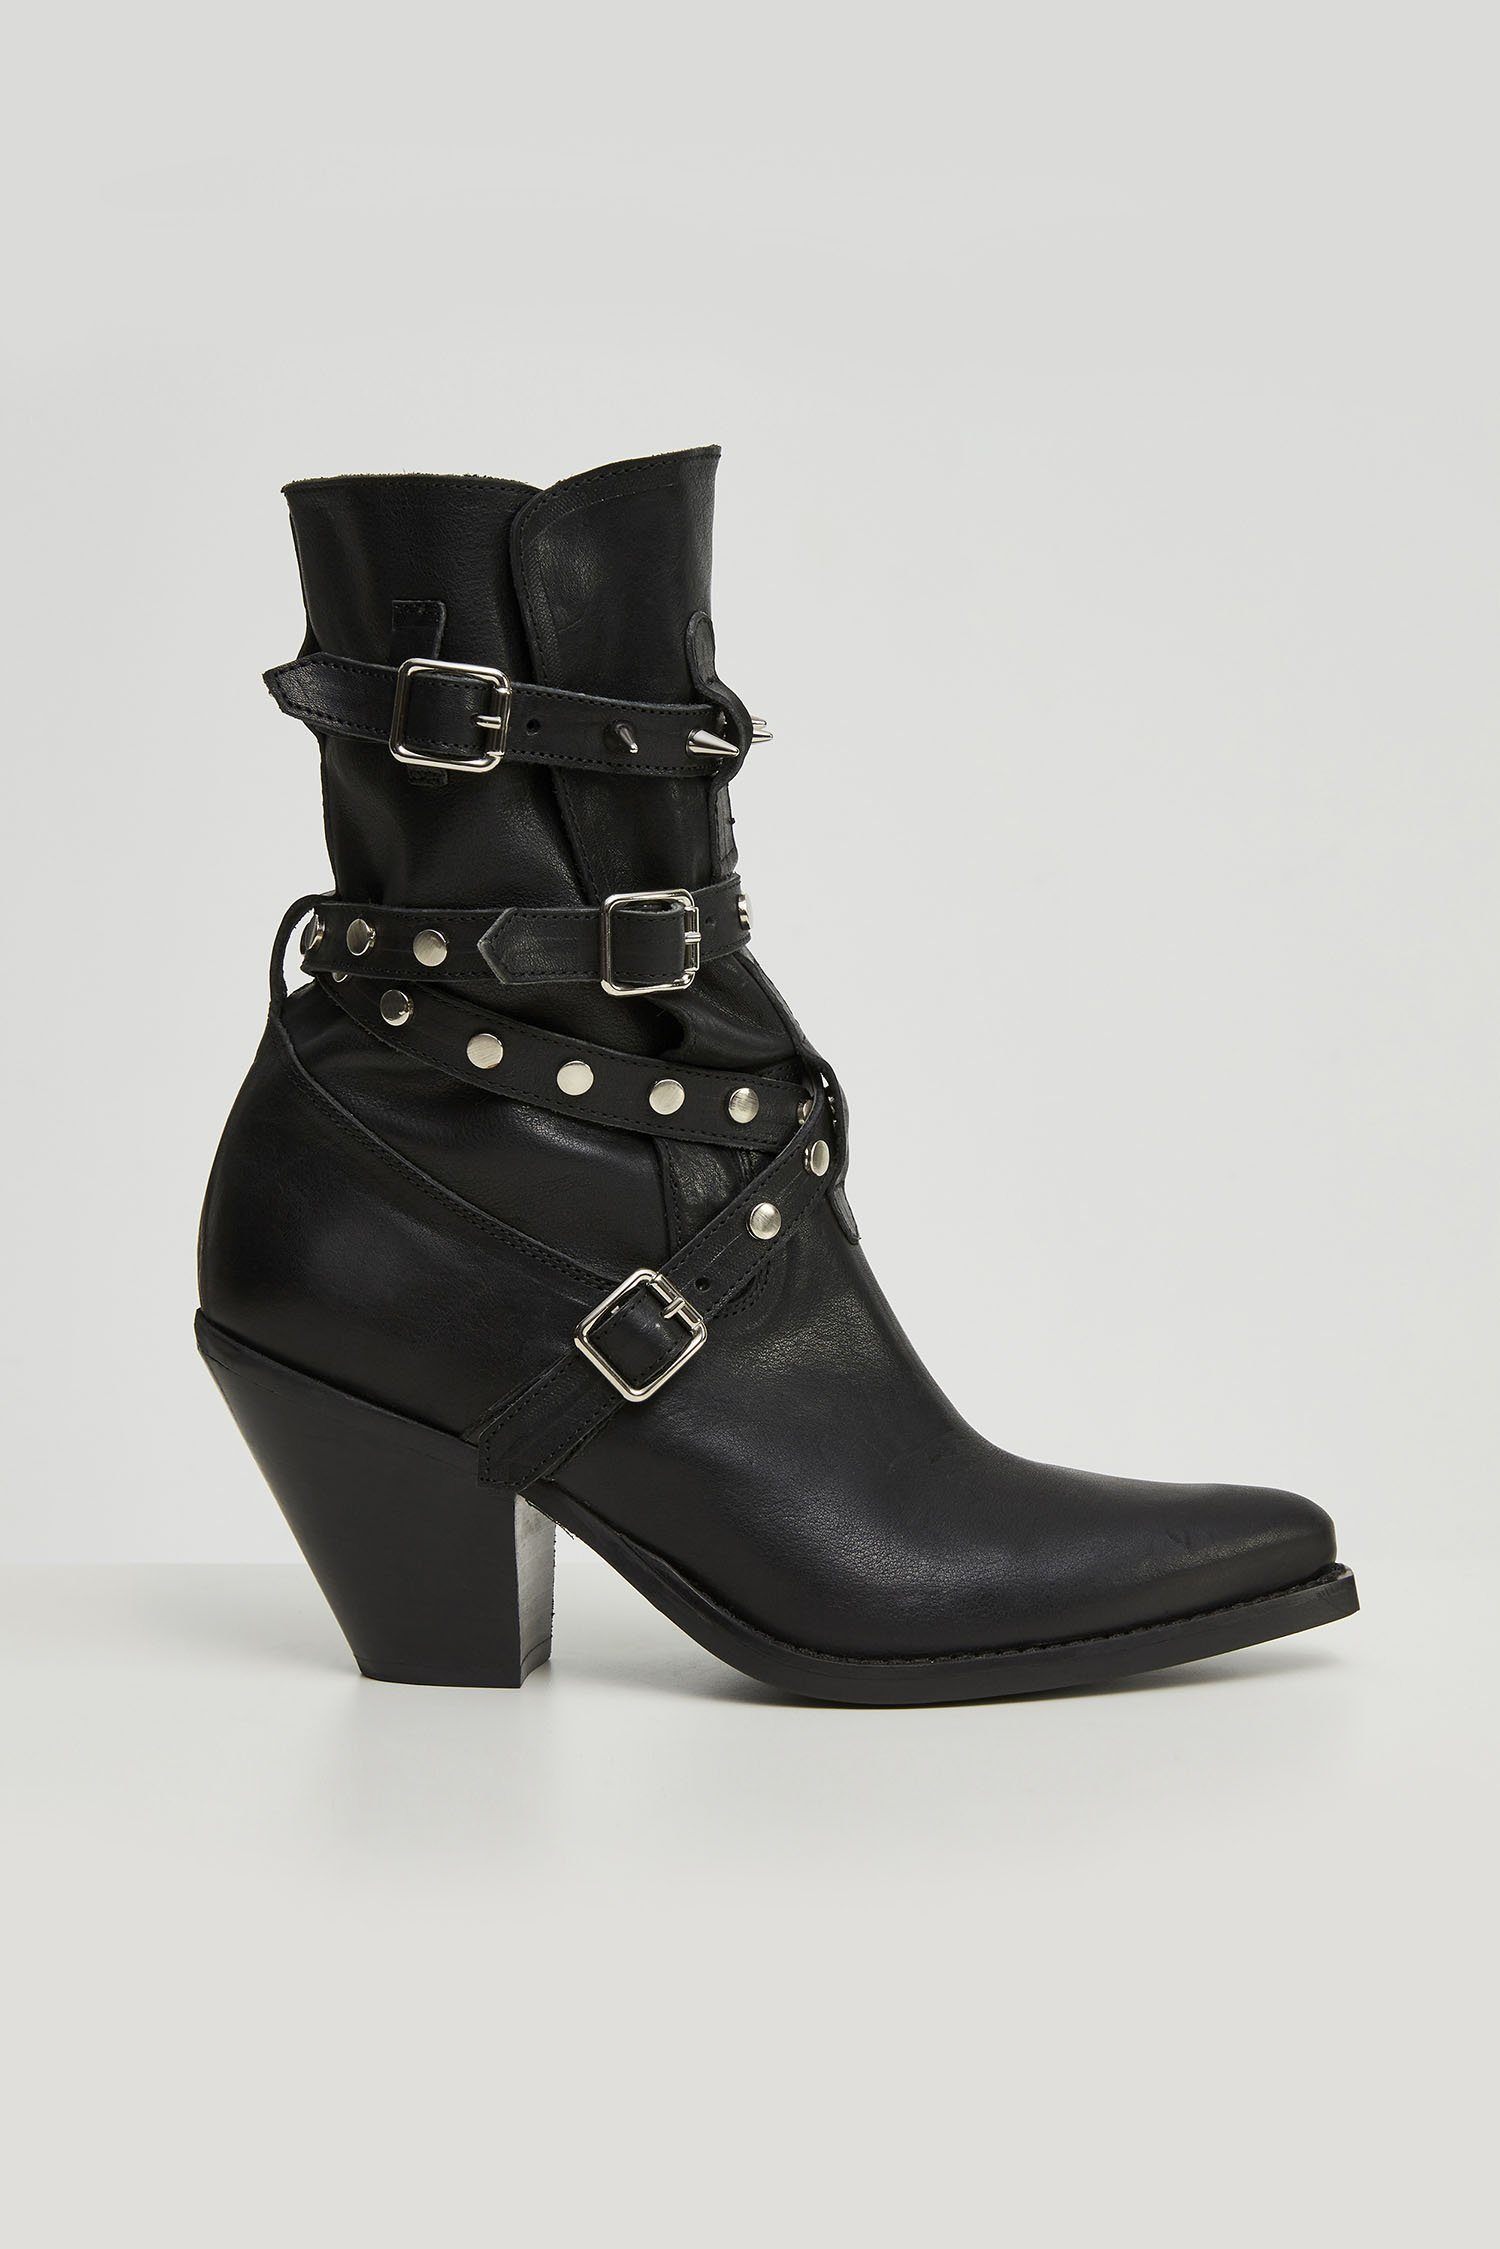 Texano Dallas Boots Aniye By